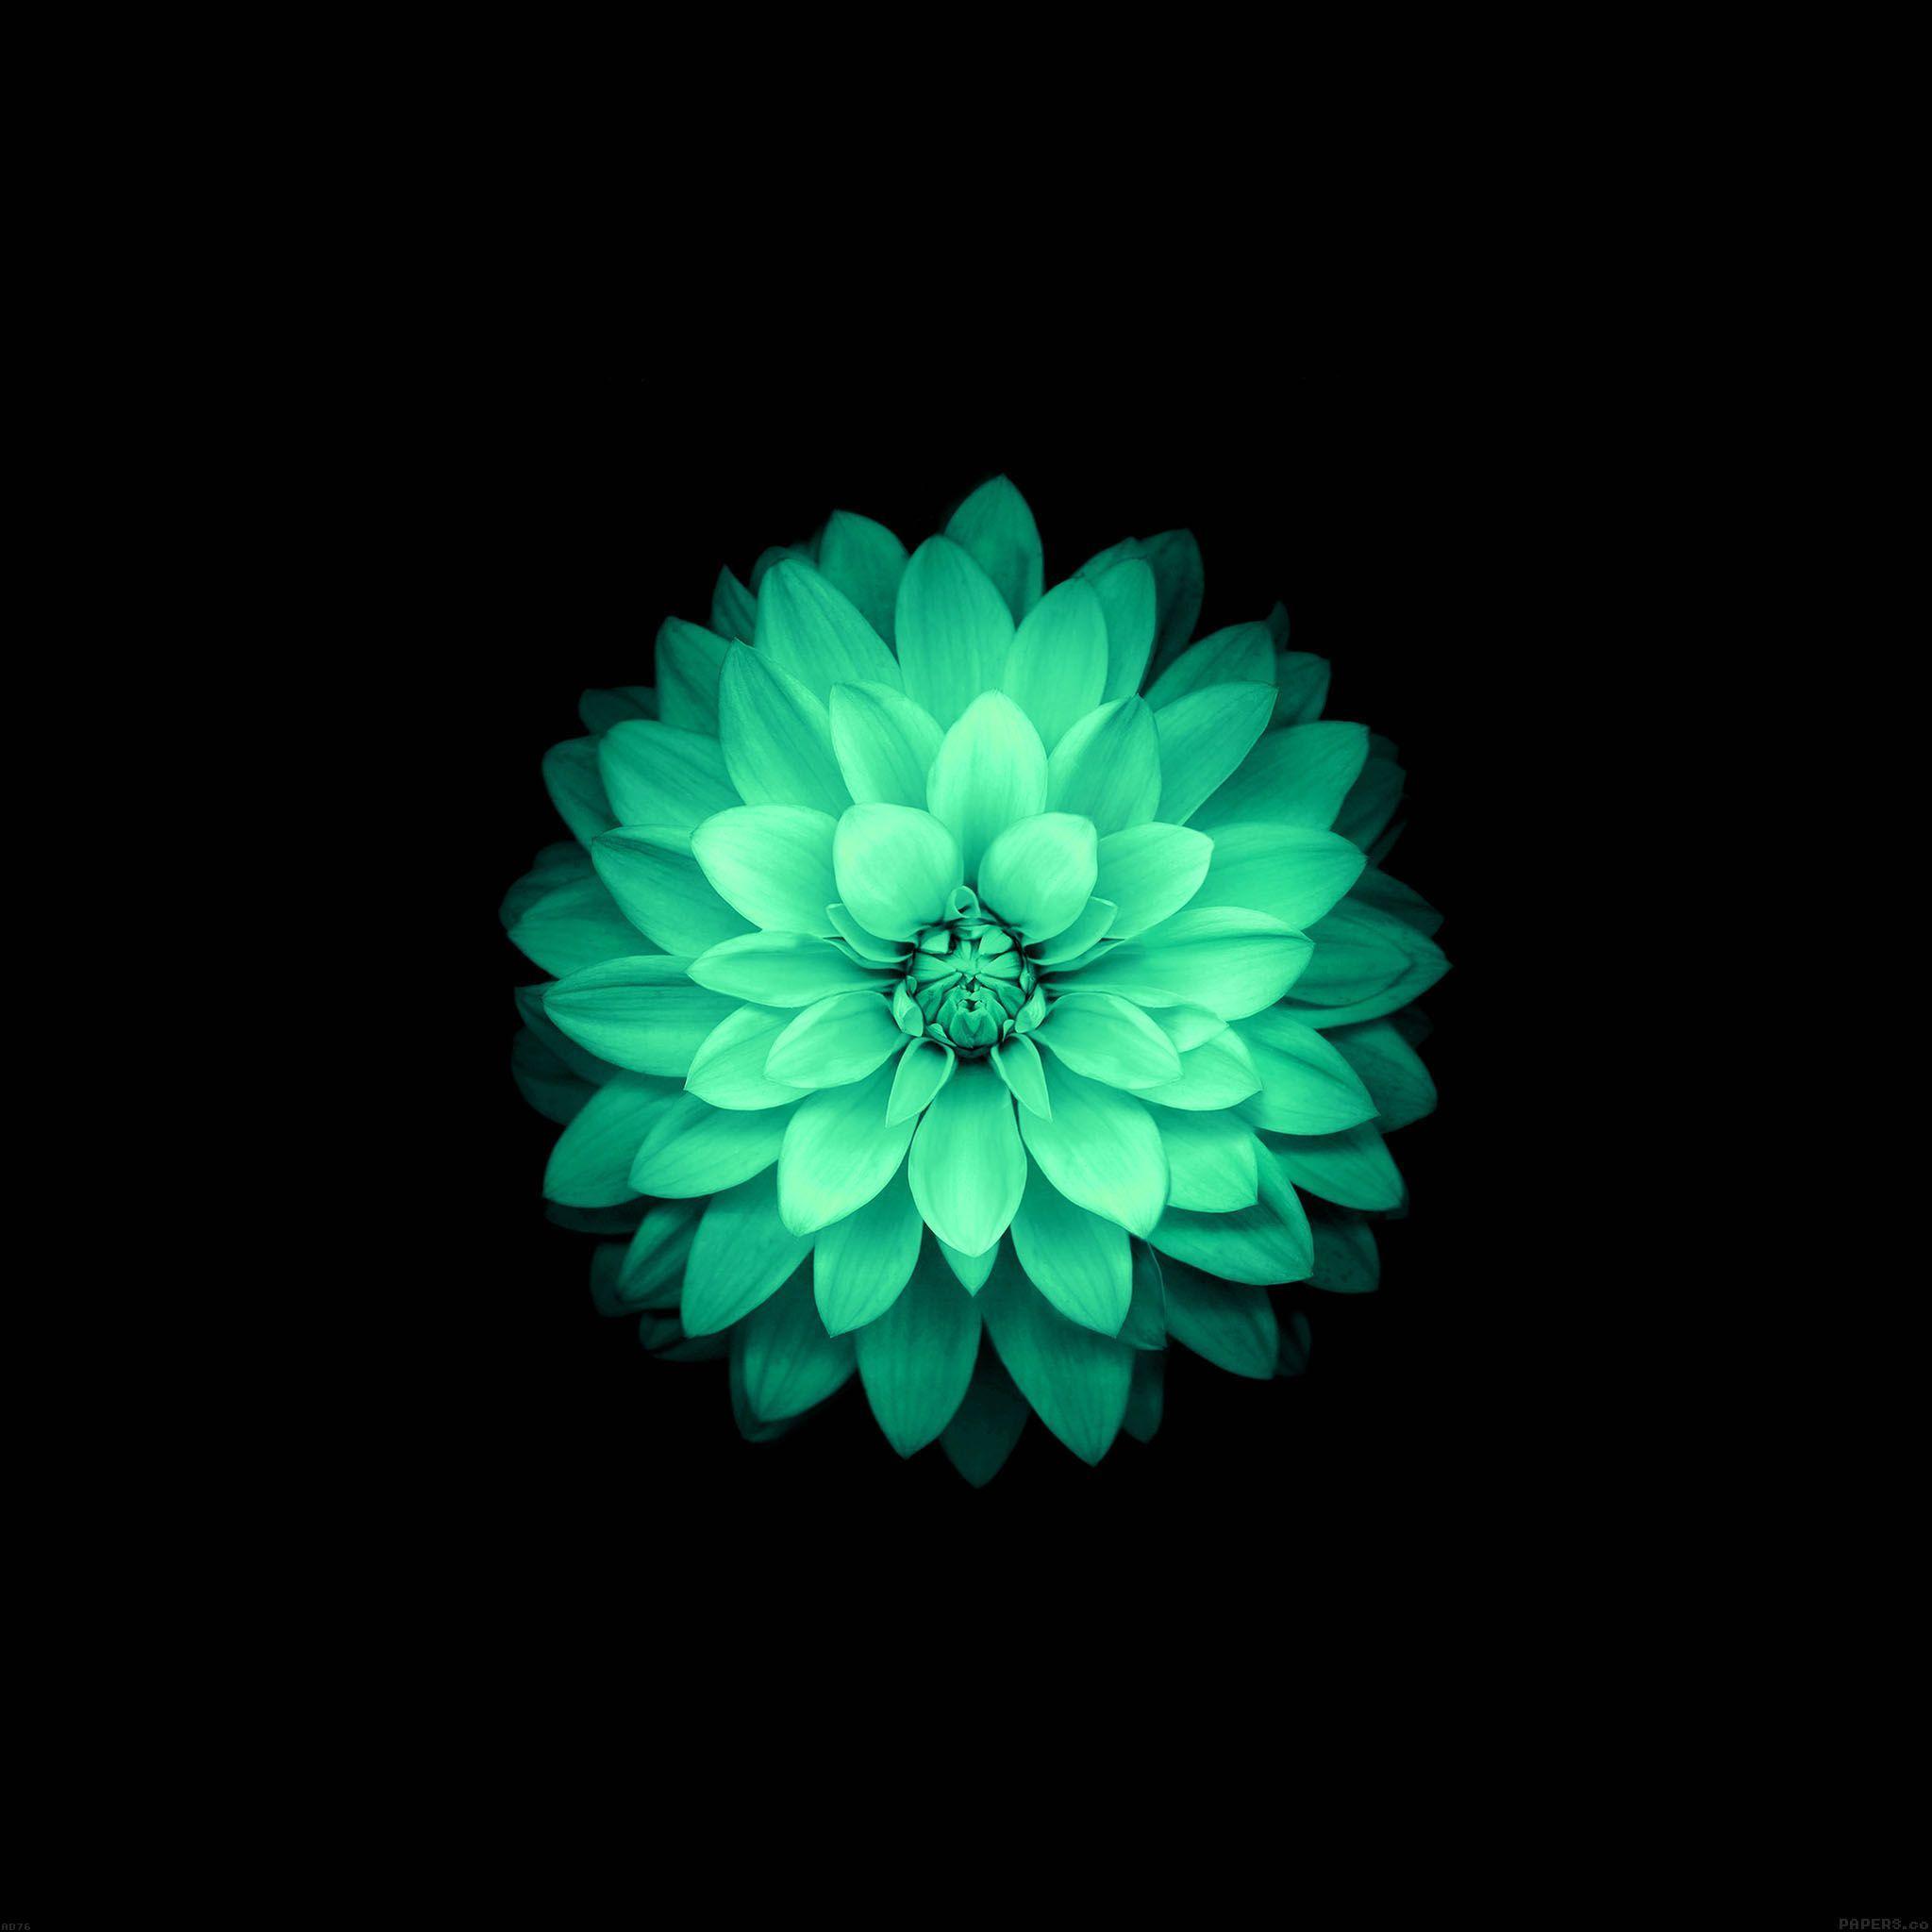 Fond Ecran Tablette Papier Peint A Fleurs Fond D Ecran Iphone Fleur Fond D Ecran Android